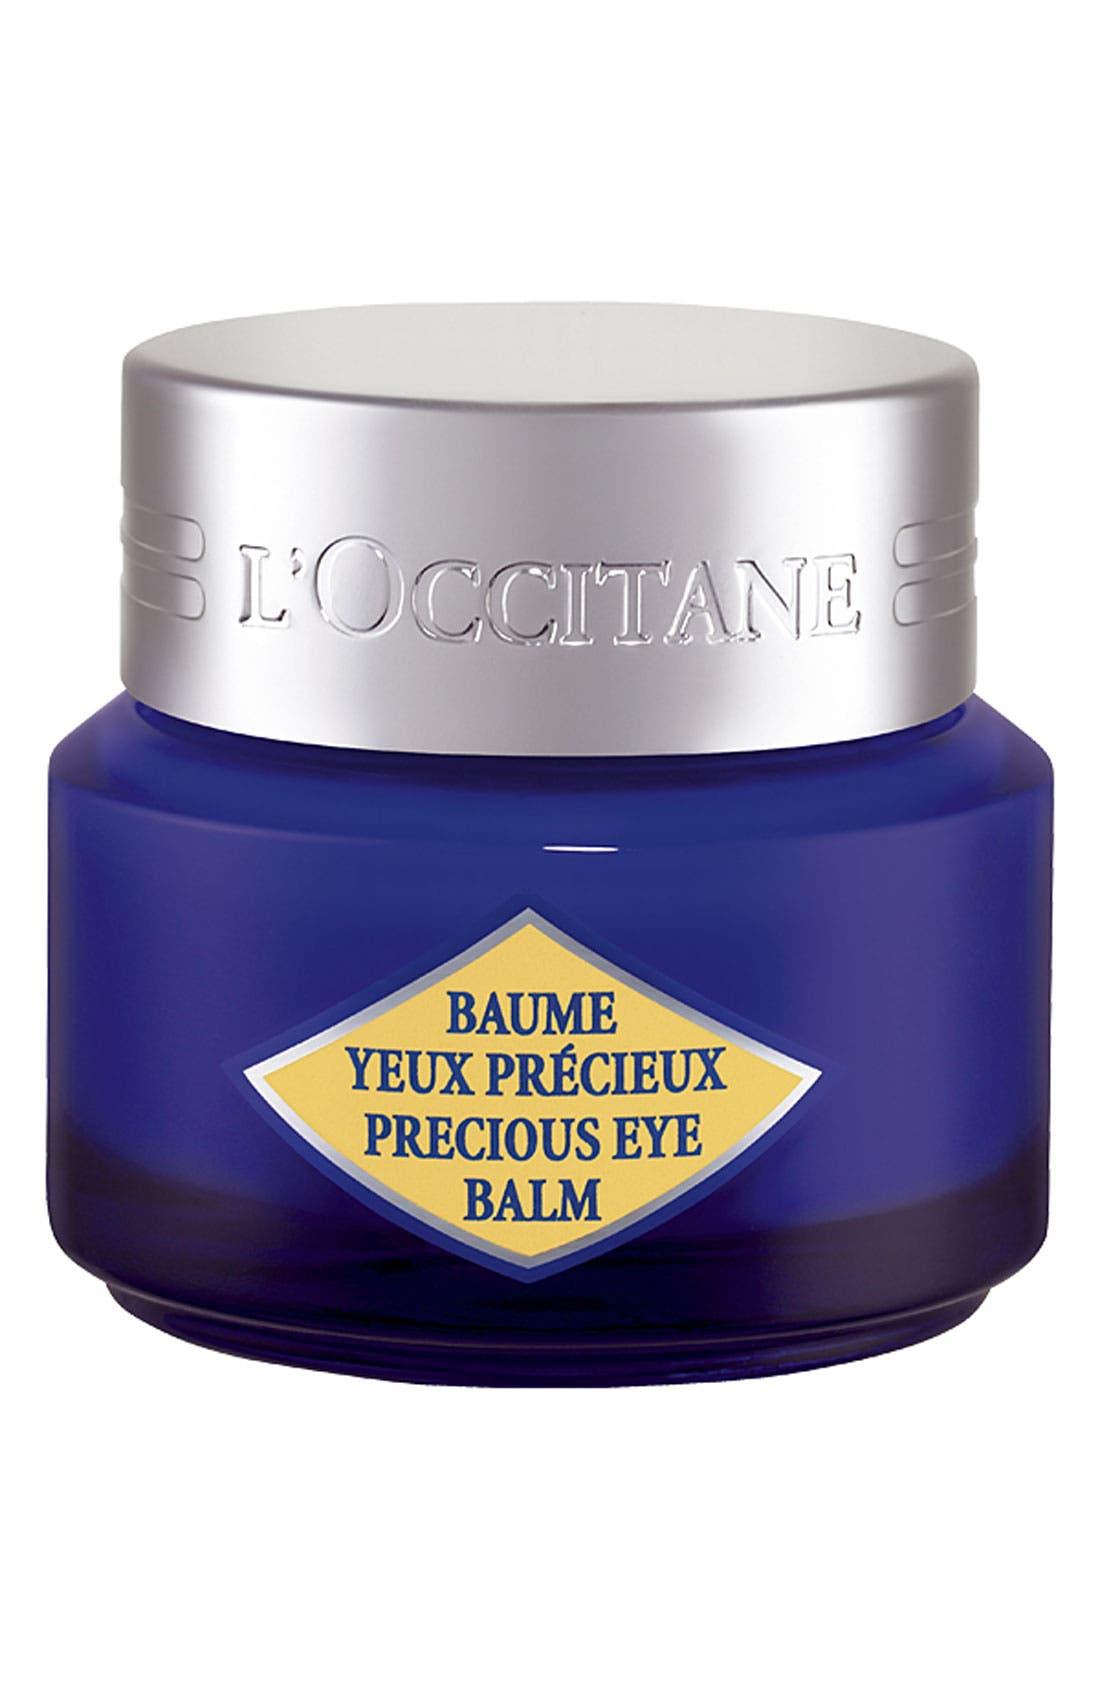 'Immortelle' Precious Eye Balm,                         Main,                         color, NO COLOR